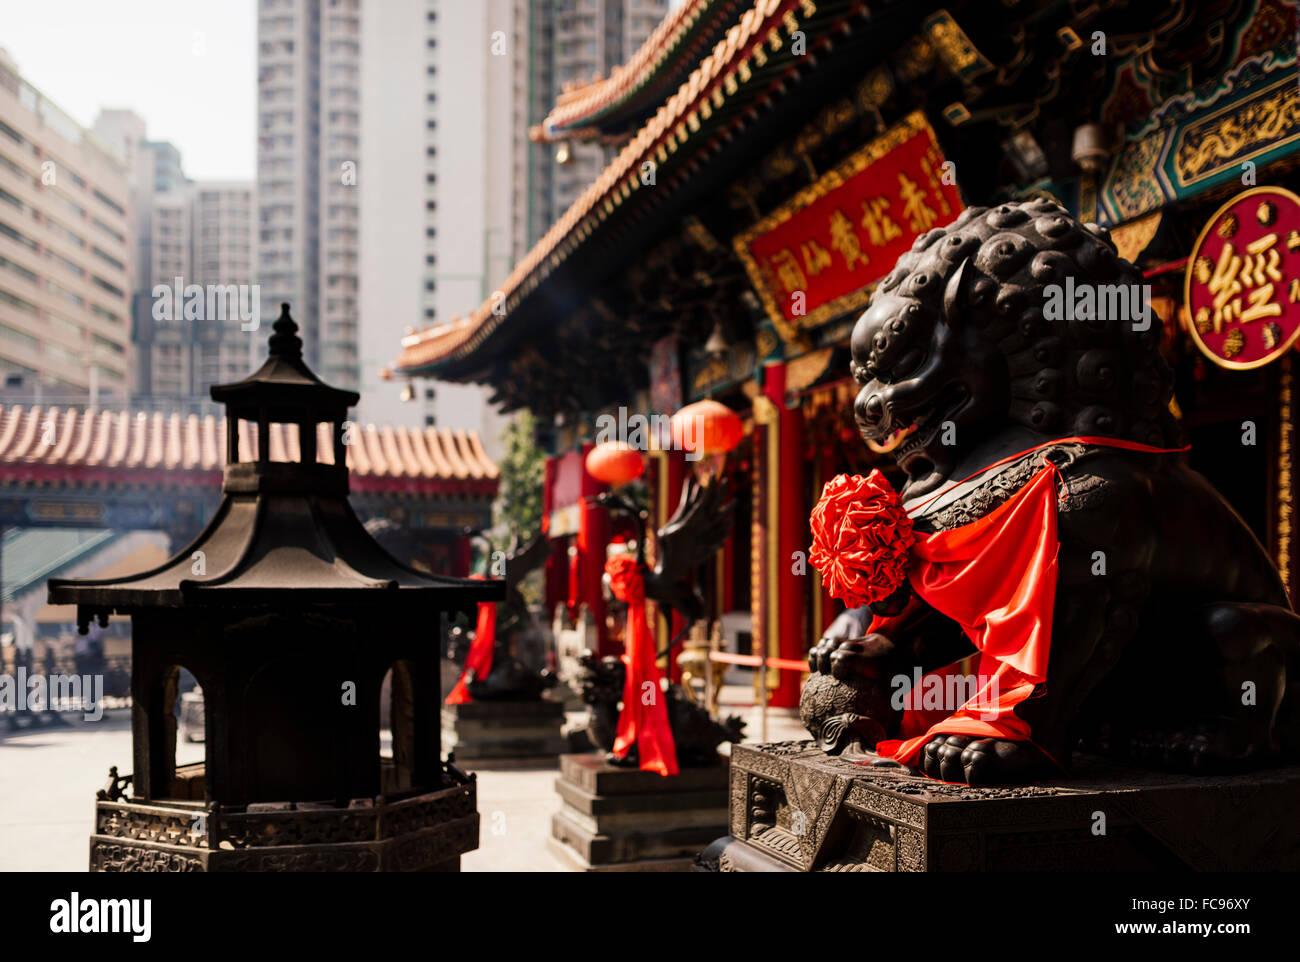 Exterior de Wong Tai Sin Temple, Kowloon, Hong Kong, China, Asia Imagen De Stock